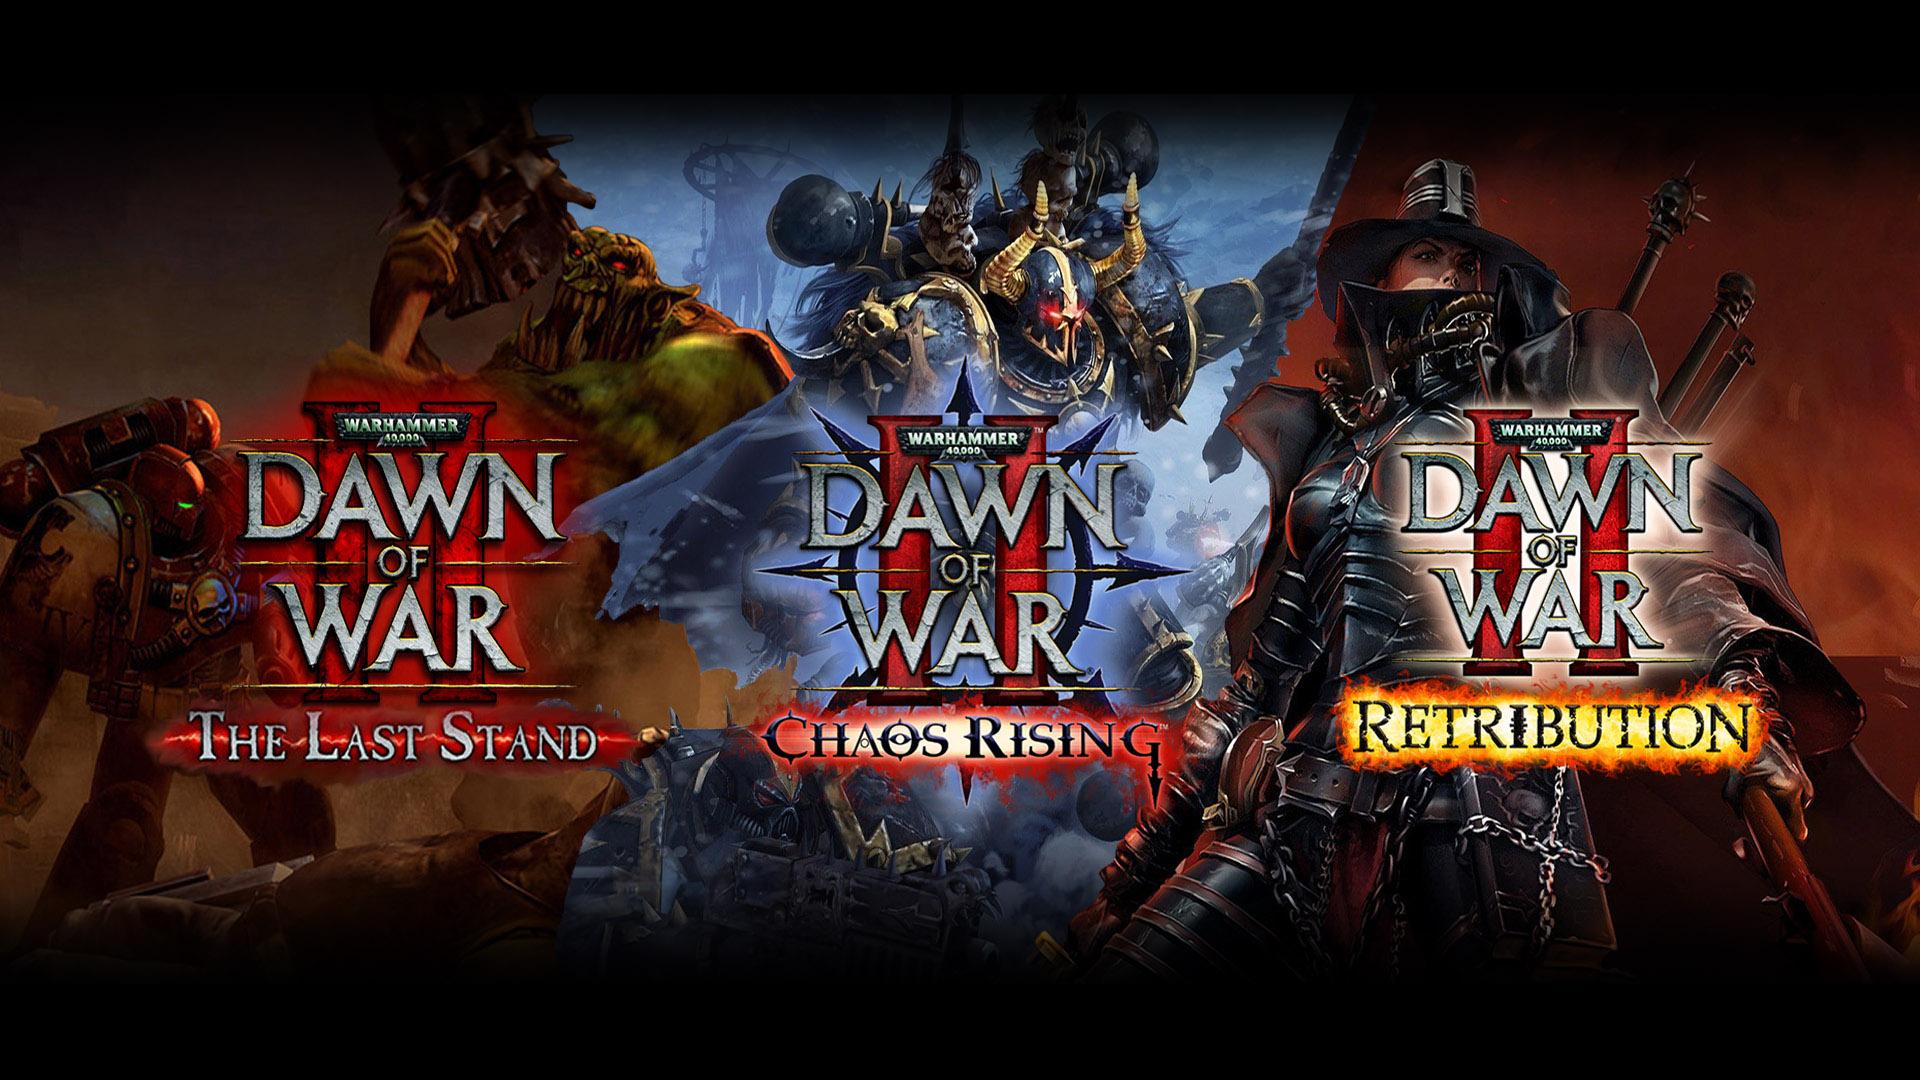 Обзор Warhammer 40k: Dawn of War II - The Last Stand, Chaos Rising, Retribution